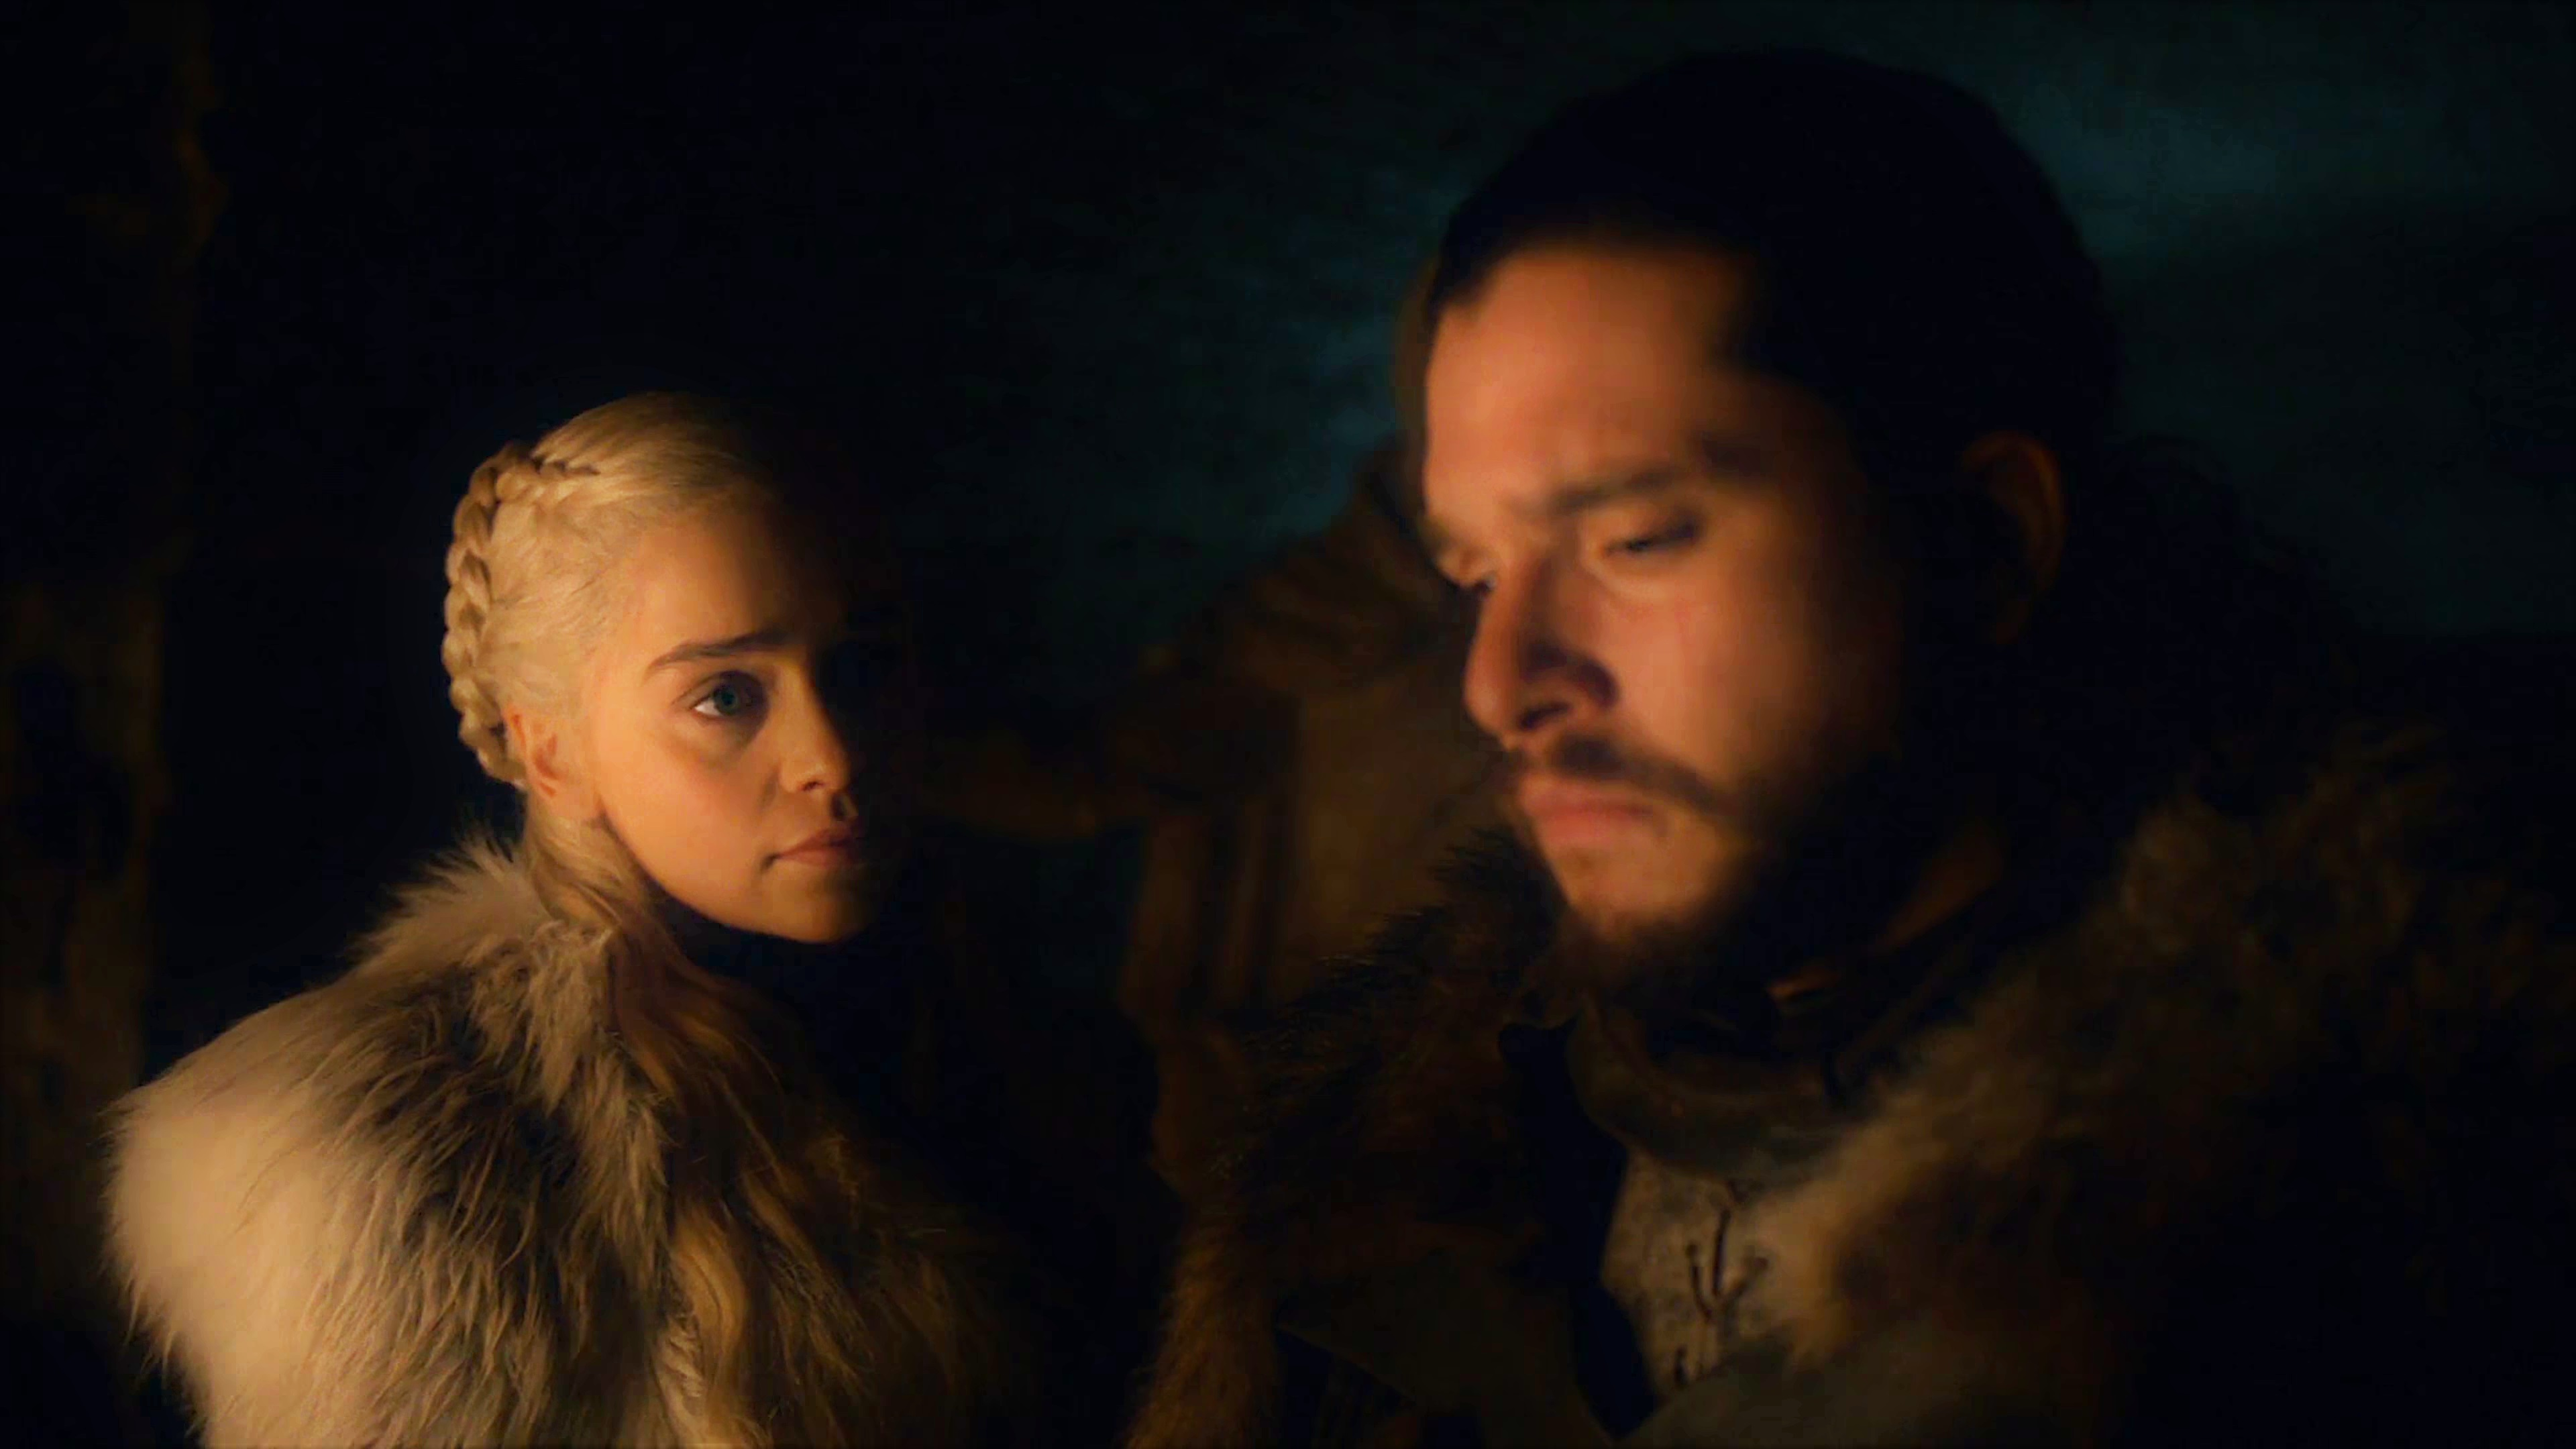 17. Season 8 Trailer Crypts Winterfell Daenerys Targaryen Jon Snow 2